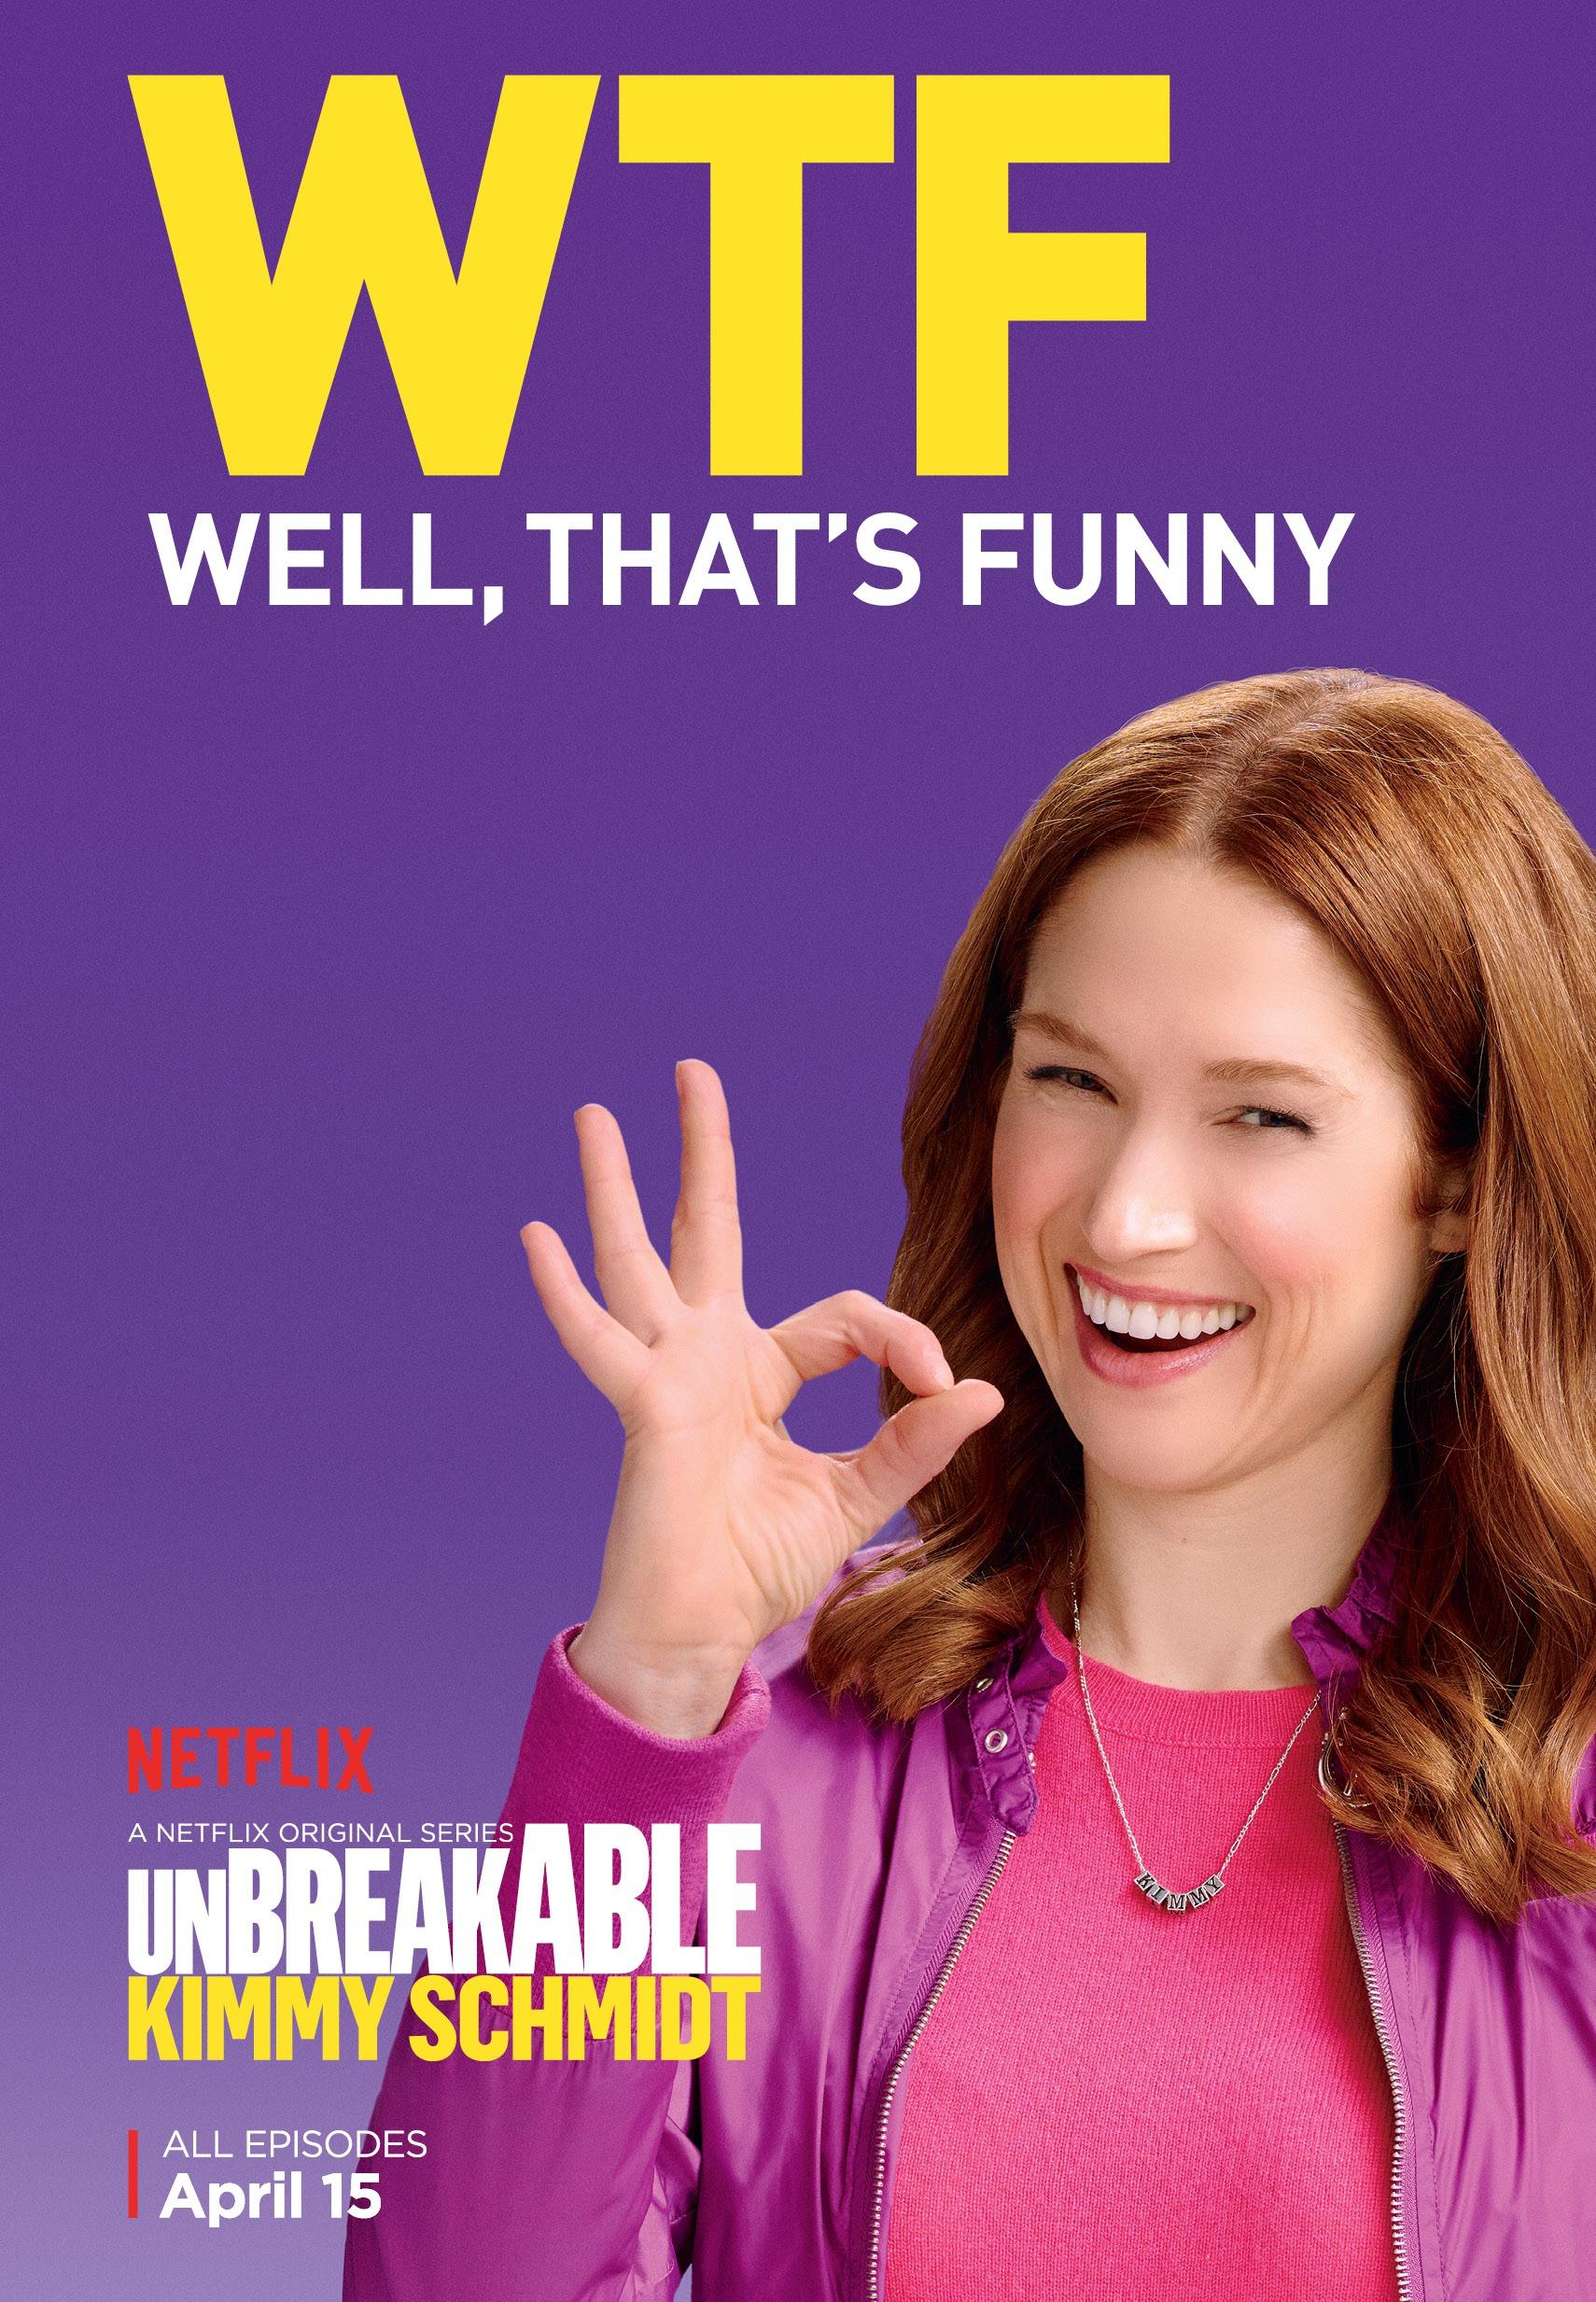 Unbreakable Kimmy Schmidt - Season 2 Poster - WTF